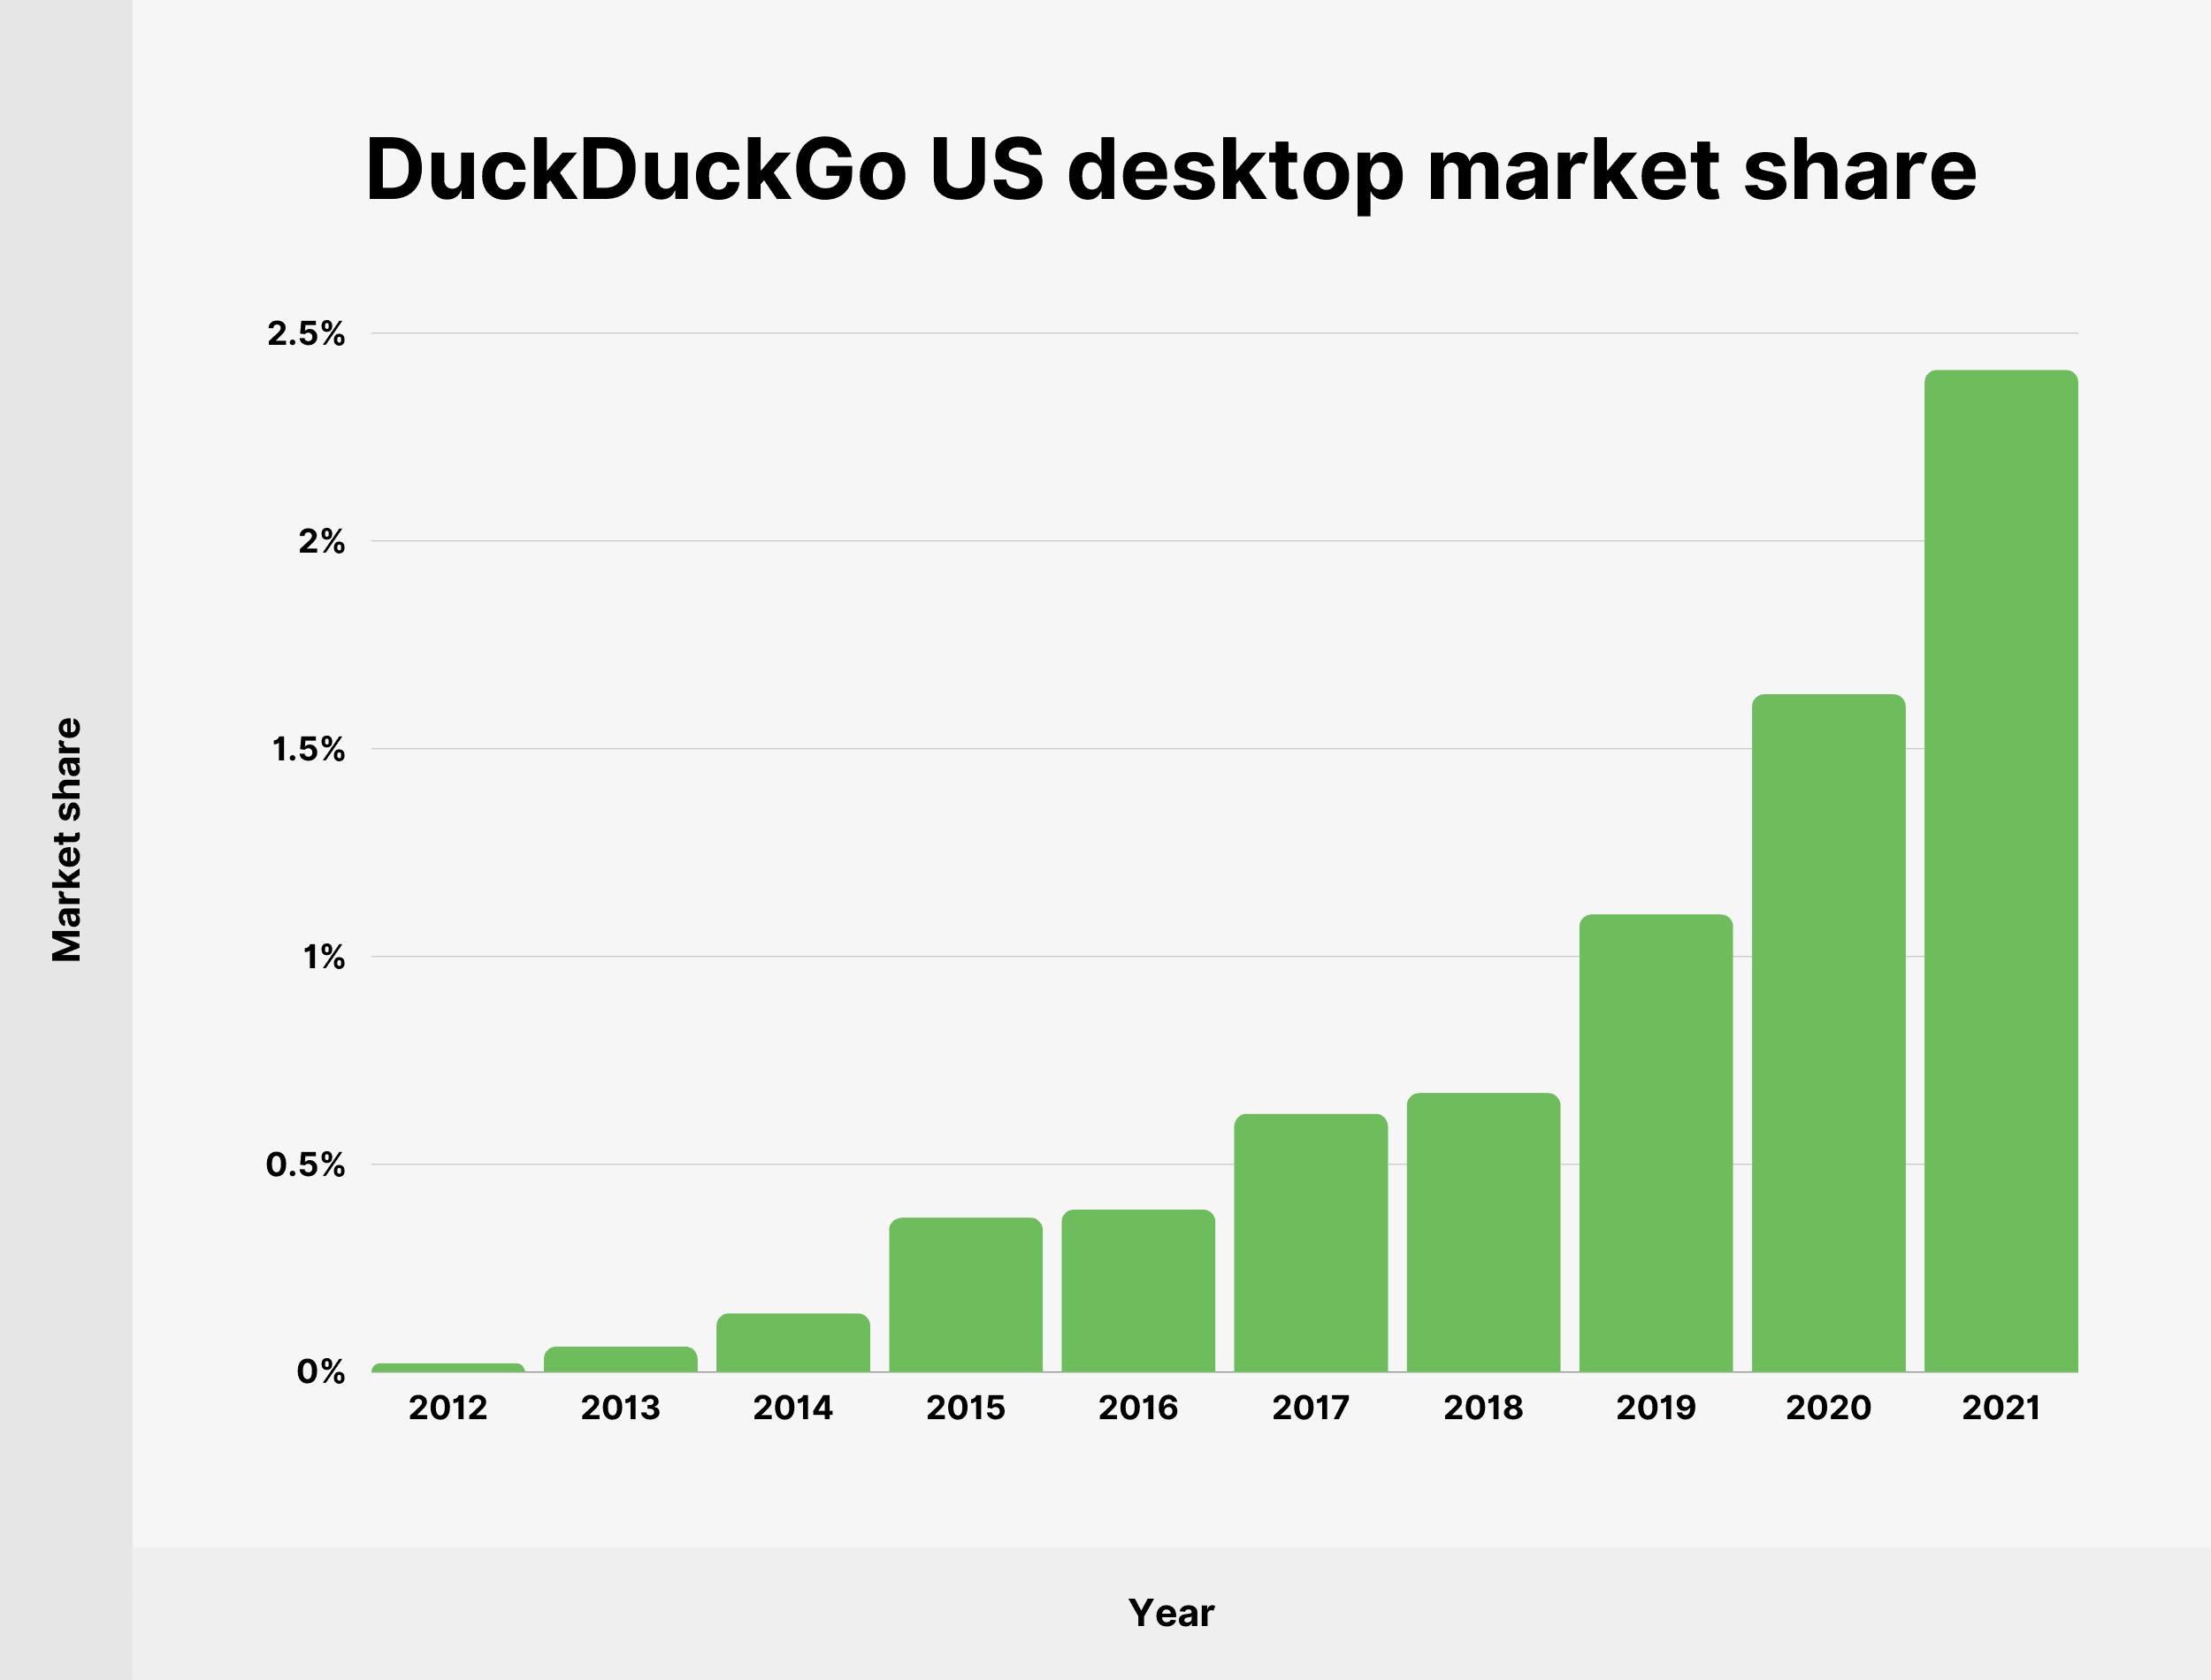 DuckDuckGo US desktop market share